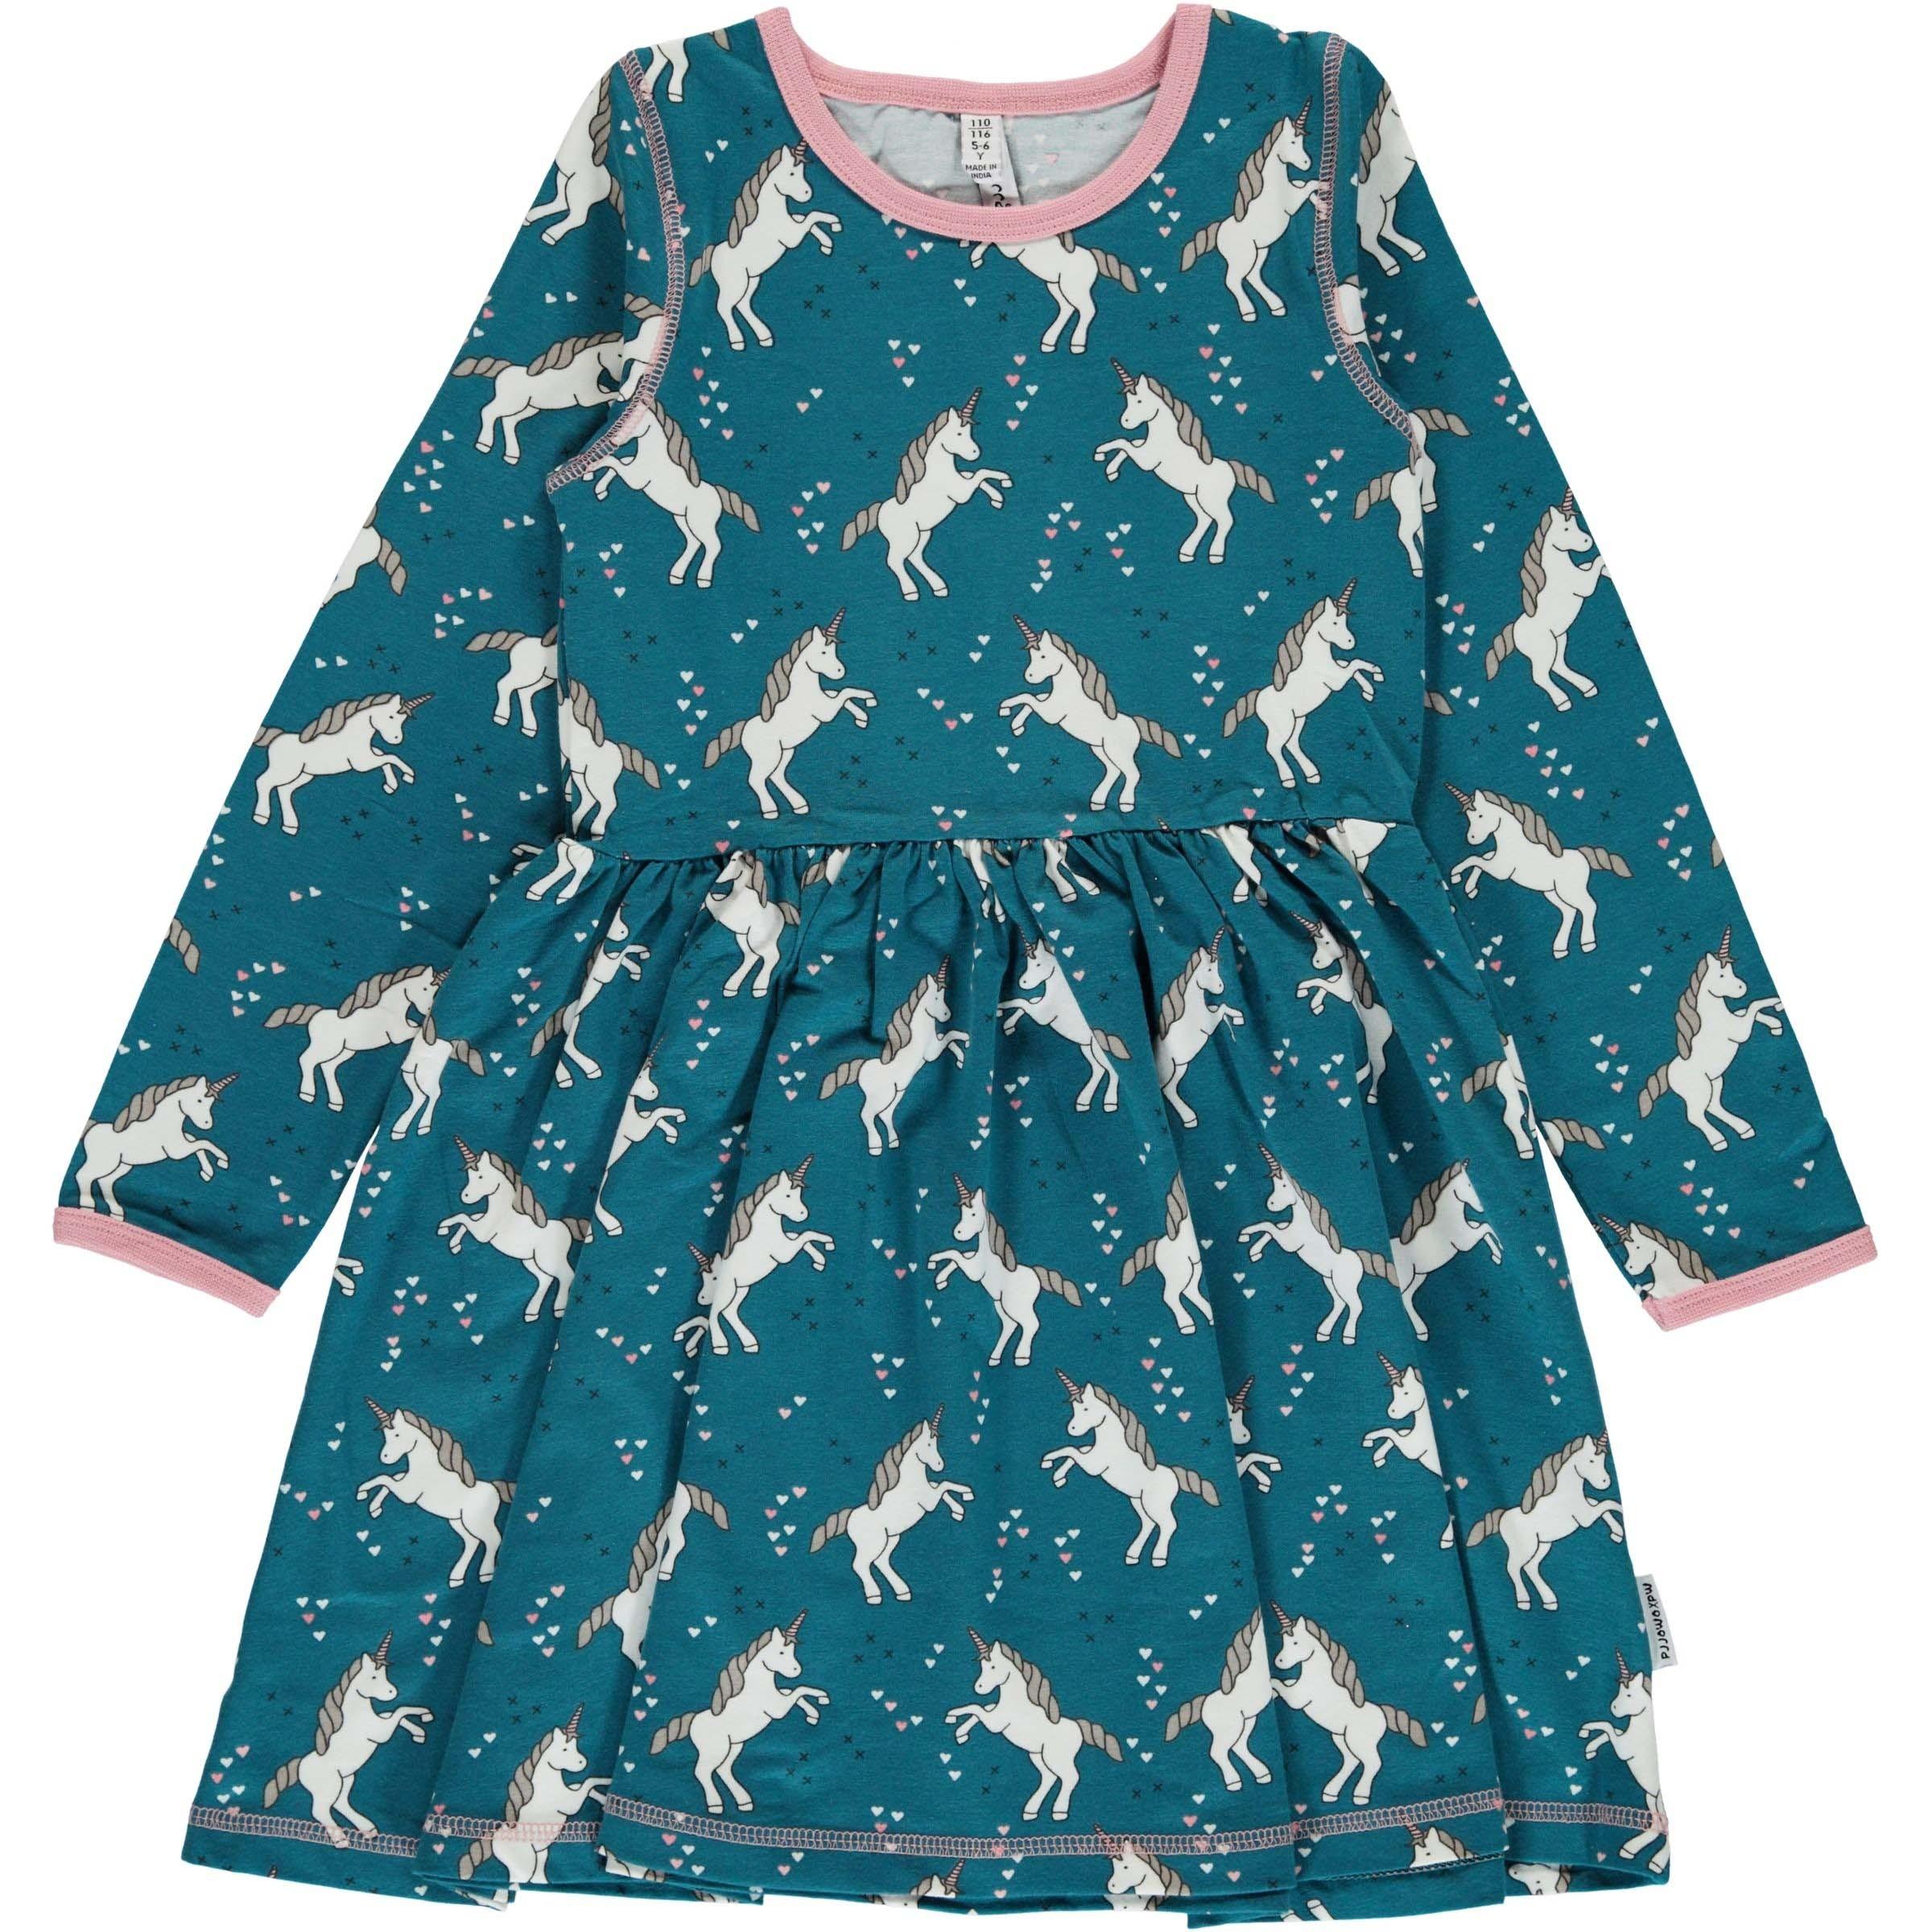 b28003a6d4aff Maxomorra Unicorn Dreams LS Spin Dress